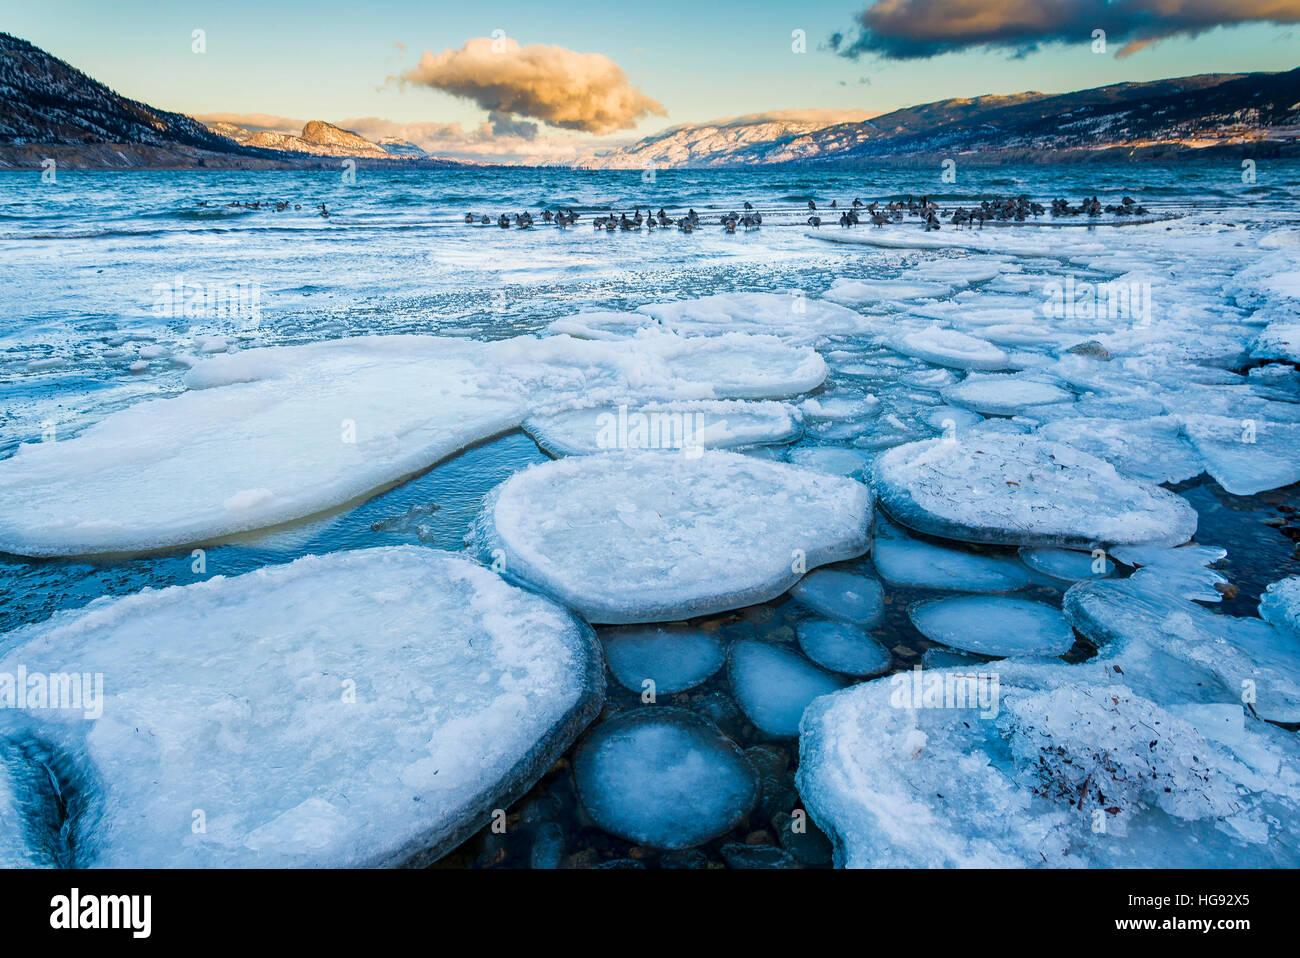 Pancake ice, le lac Okanagan, Penticton, , British Columbia, Canada. Photo Stock